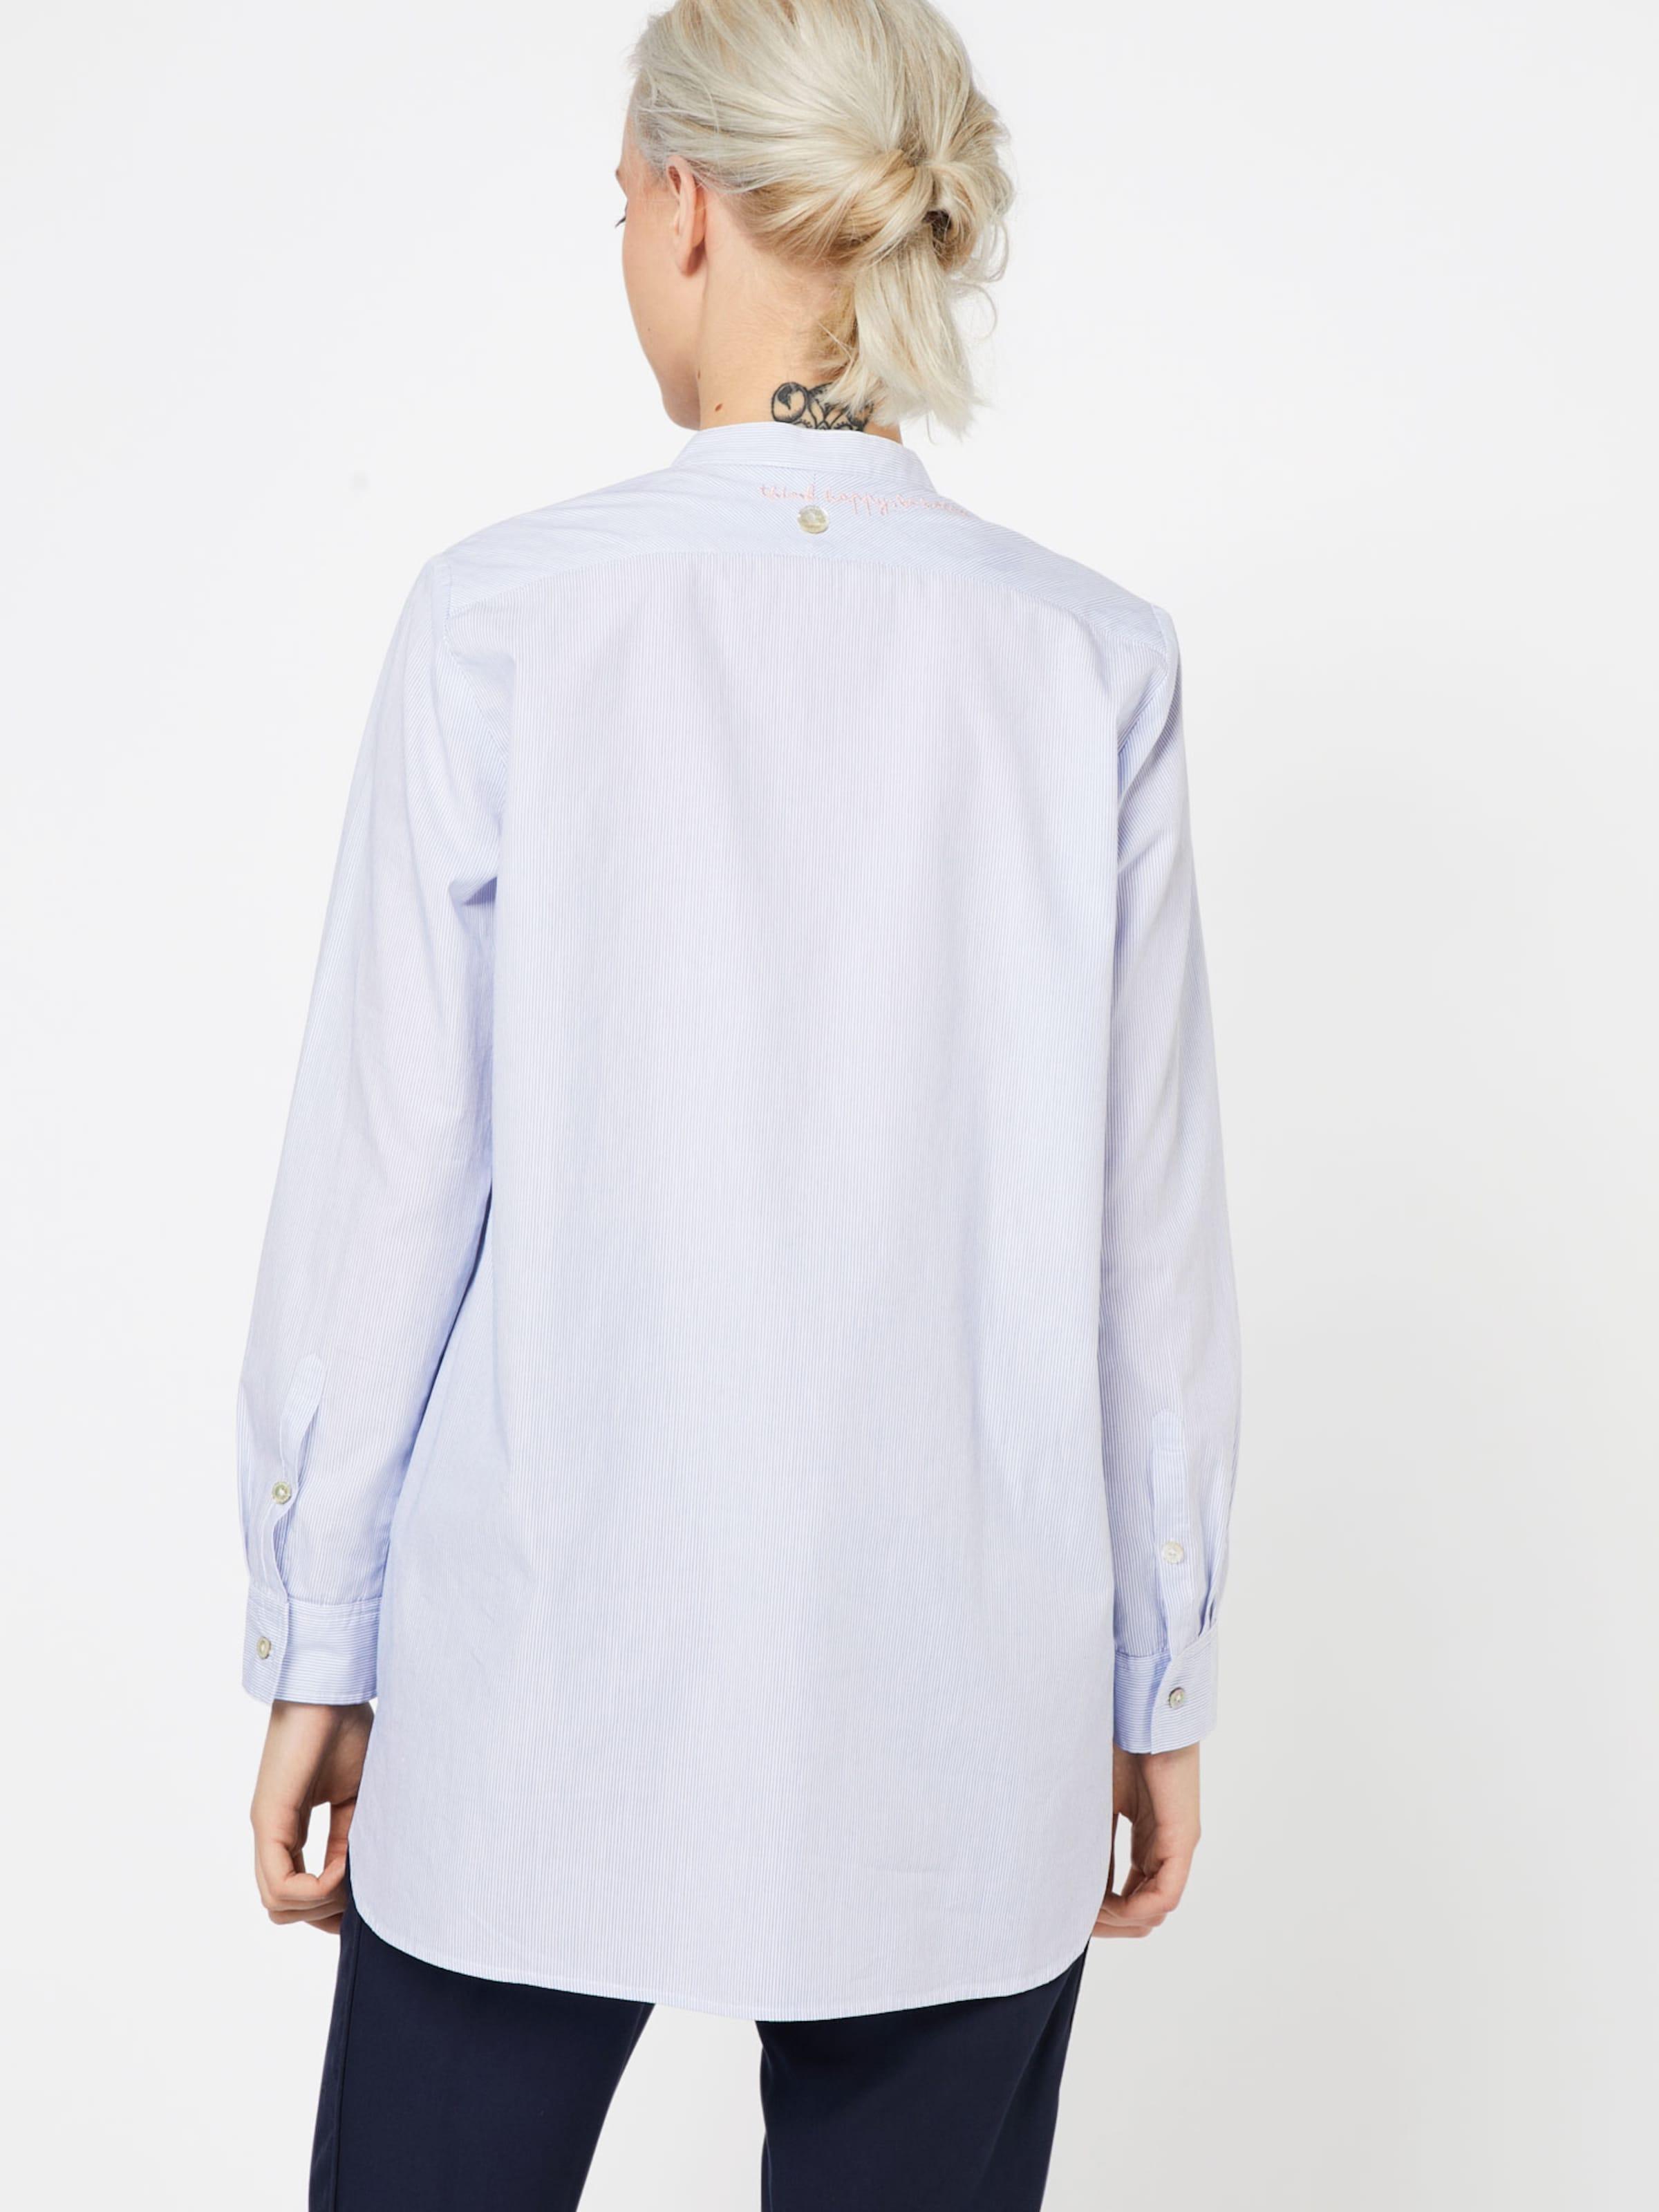 LIEBLINGSST脺CK Bluse LIEBLINGSST脺CK 'Ester' Bluse Bluse 'Ester' 'Ester' LIEBLINGSST脺CK LIEBLINGSST脺CK qZ0zt